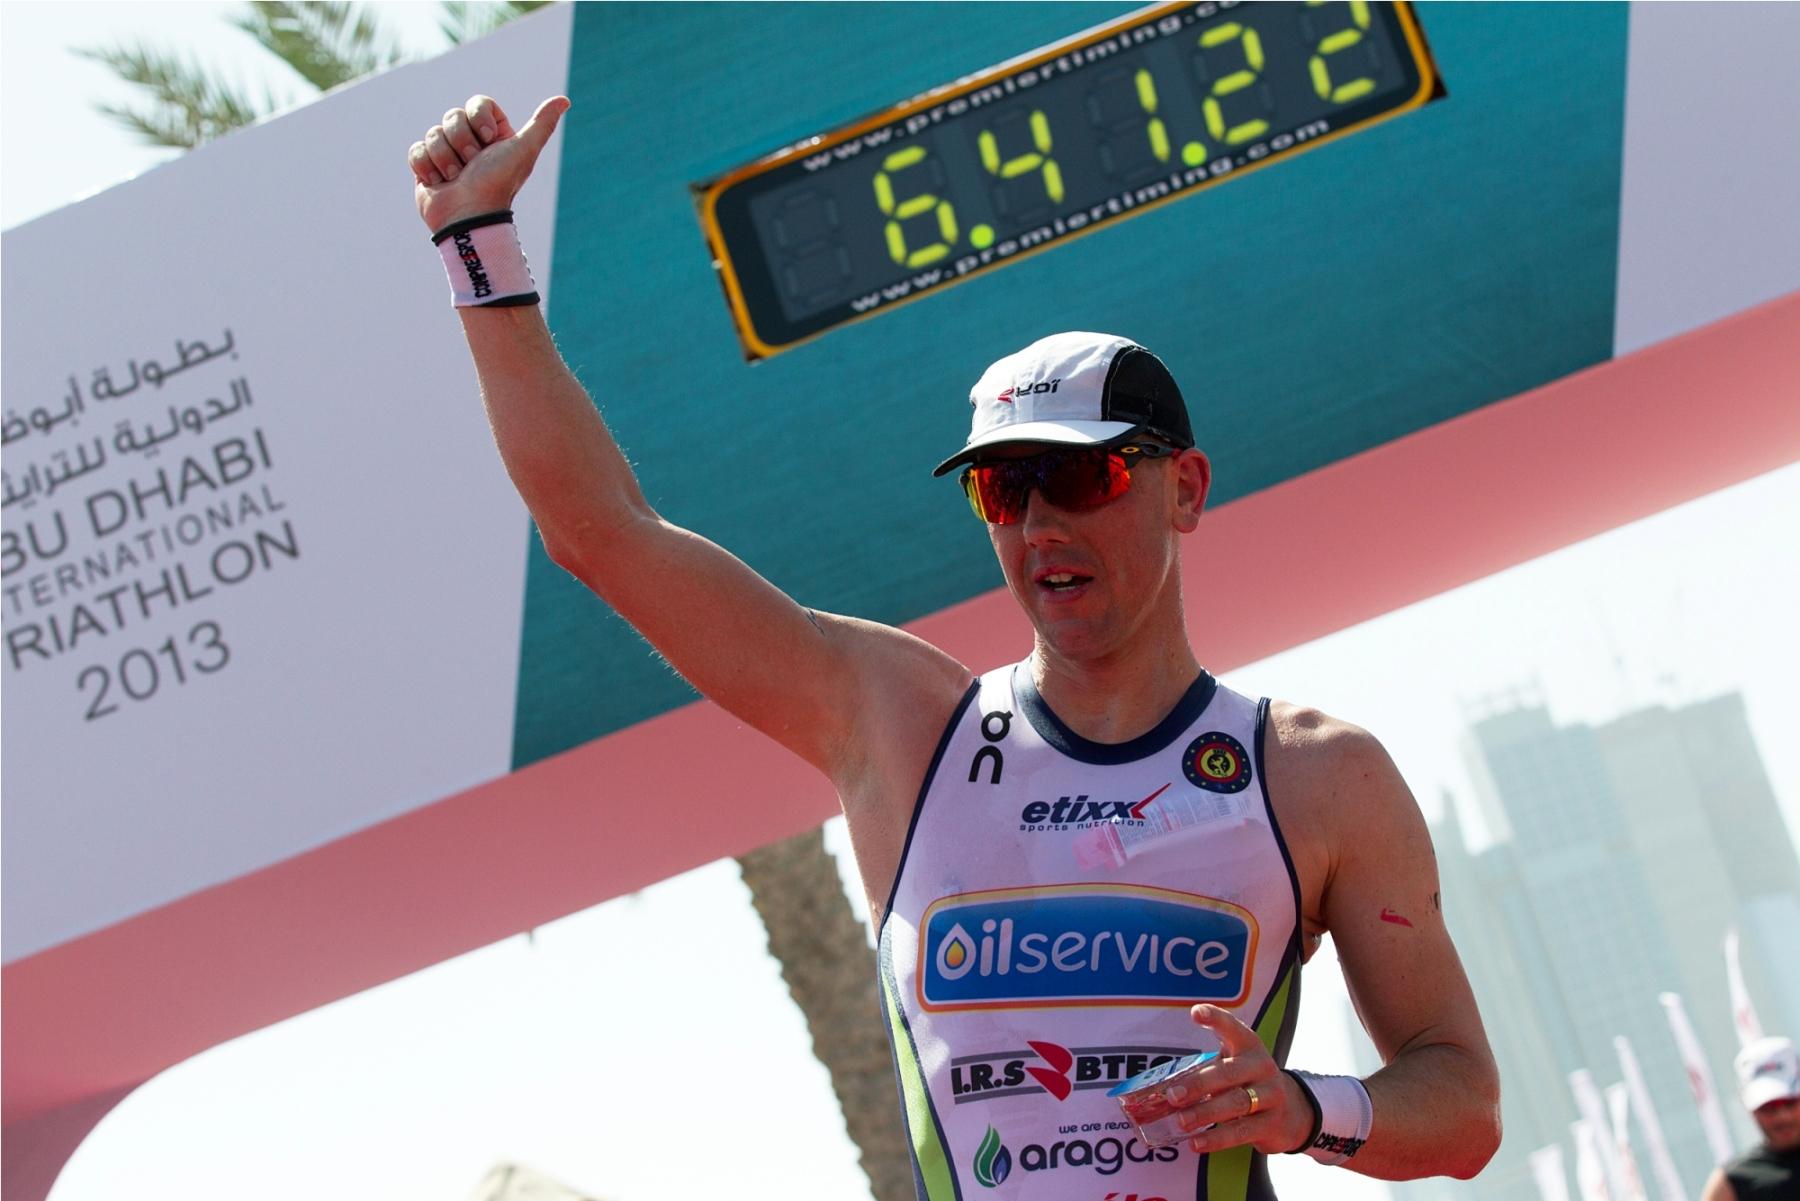 Abu Dhabi International Triathlon: Defending Champion Looking For Hat Trick